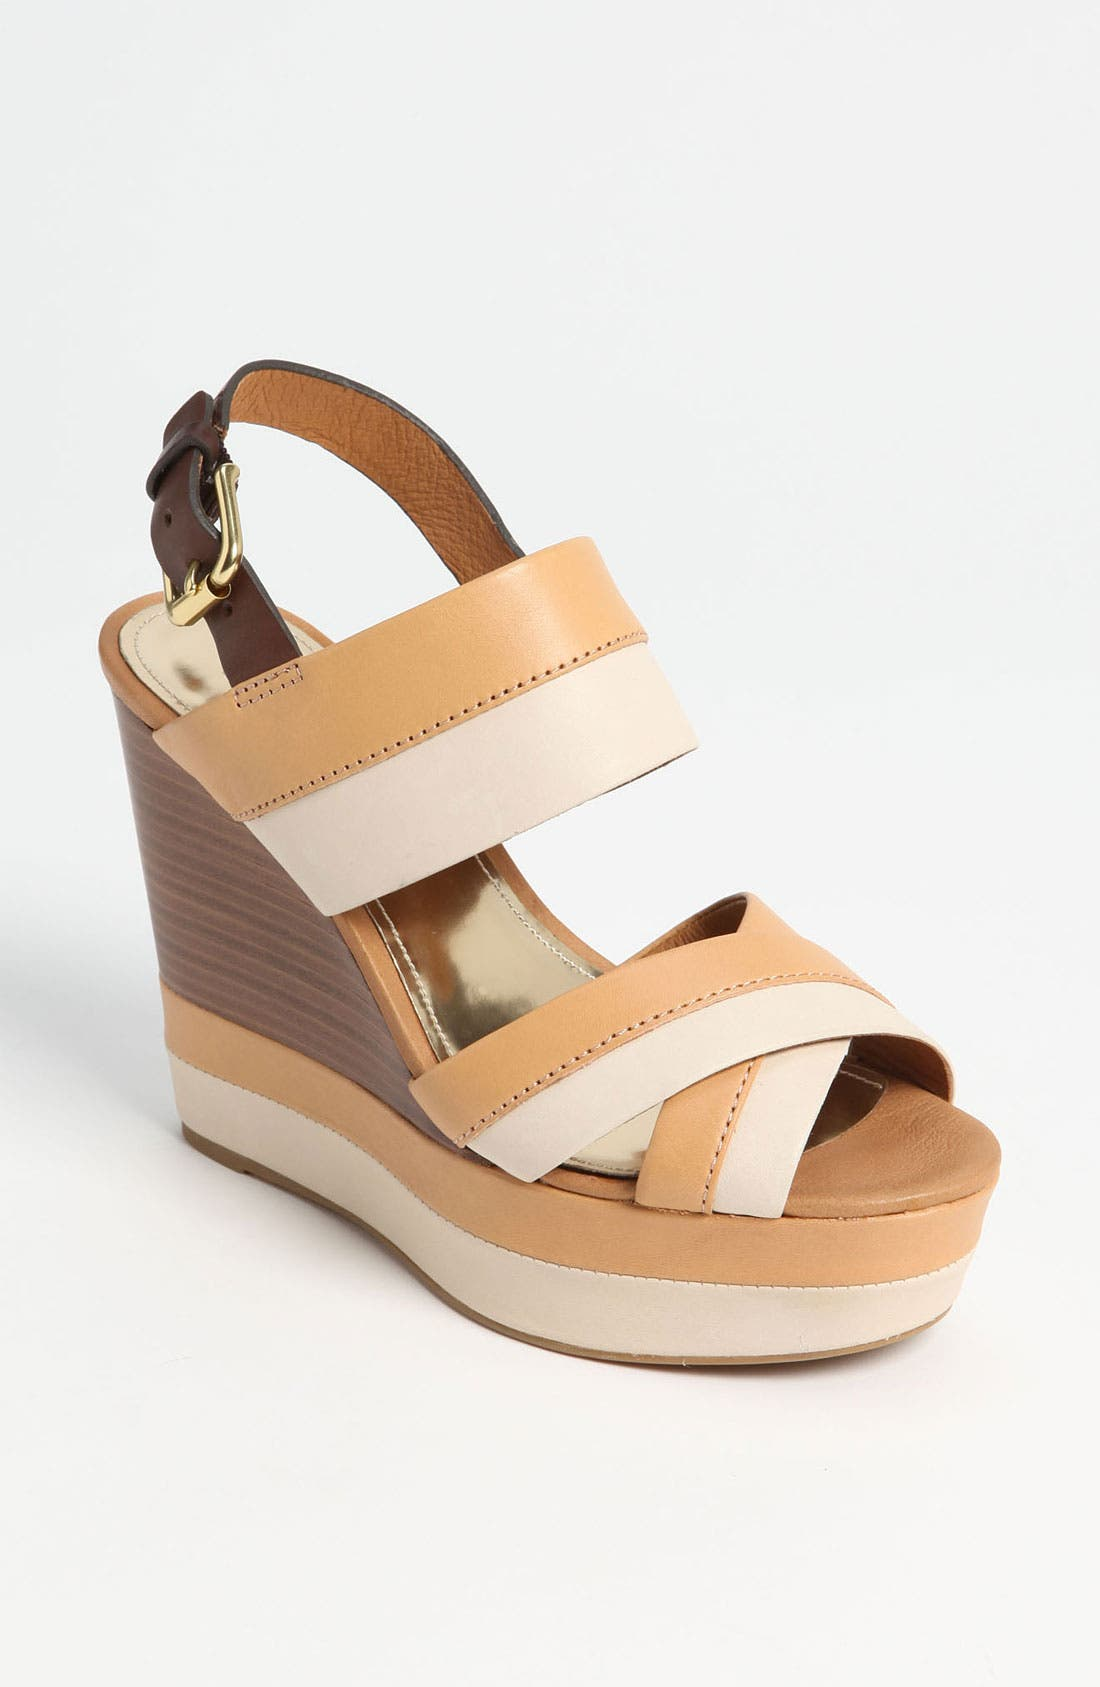 Main Image - COACH 'Gaile' Wedge Sandal